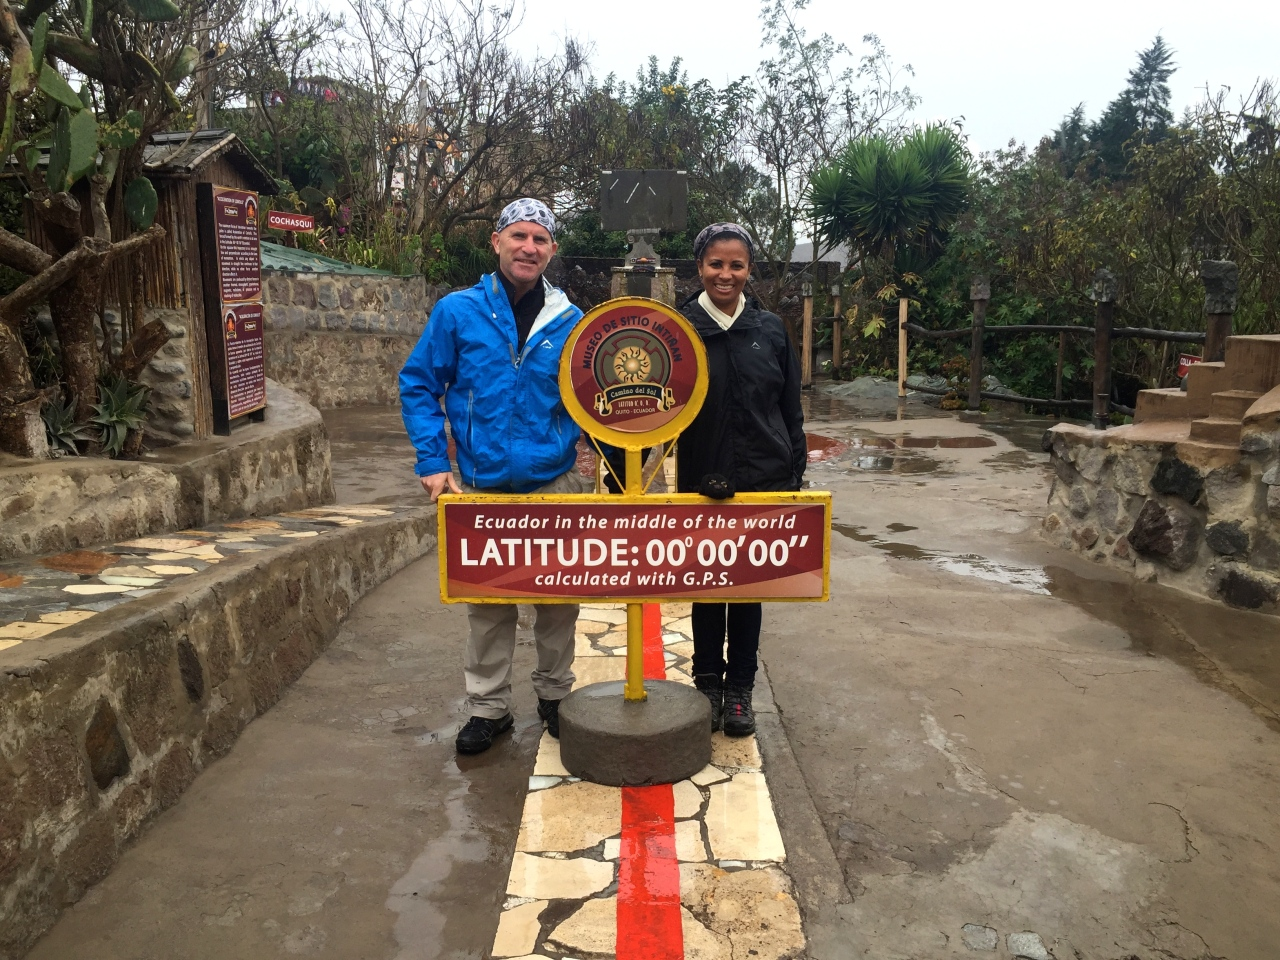 Lost at La Mitad delMundo